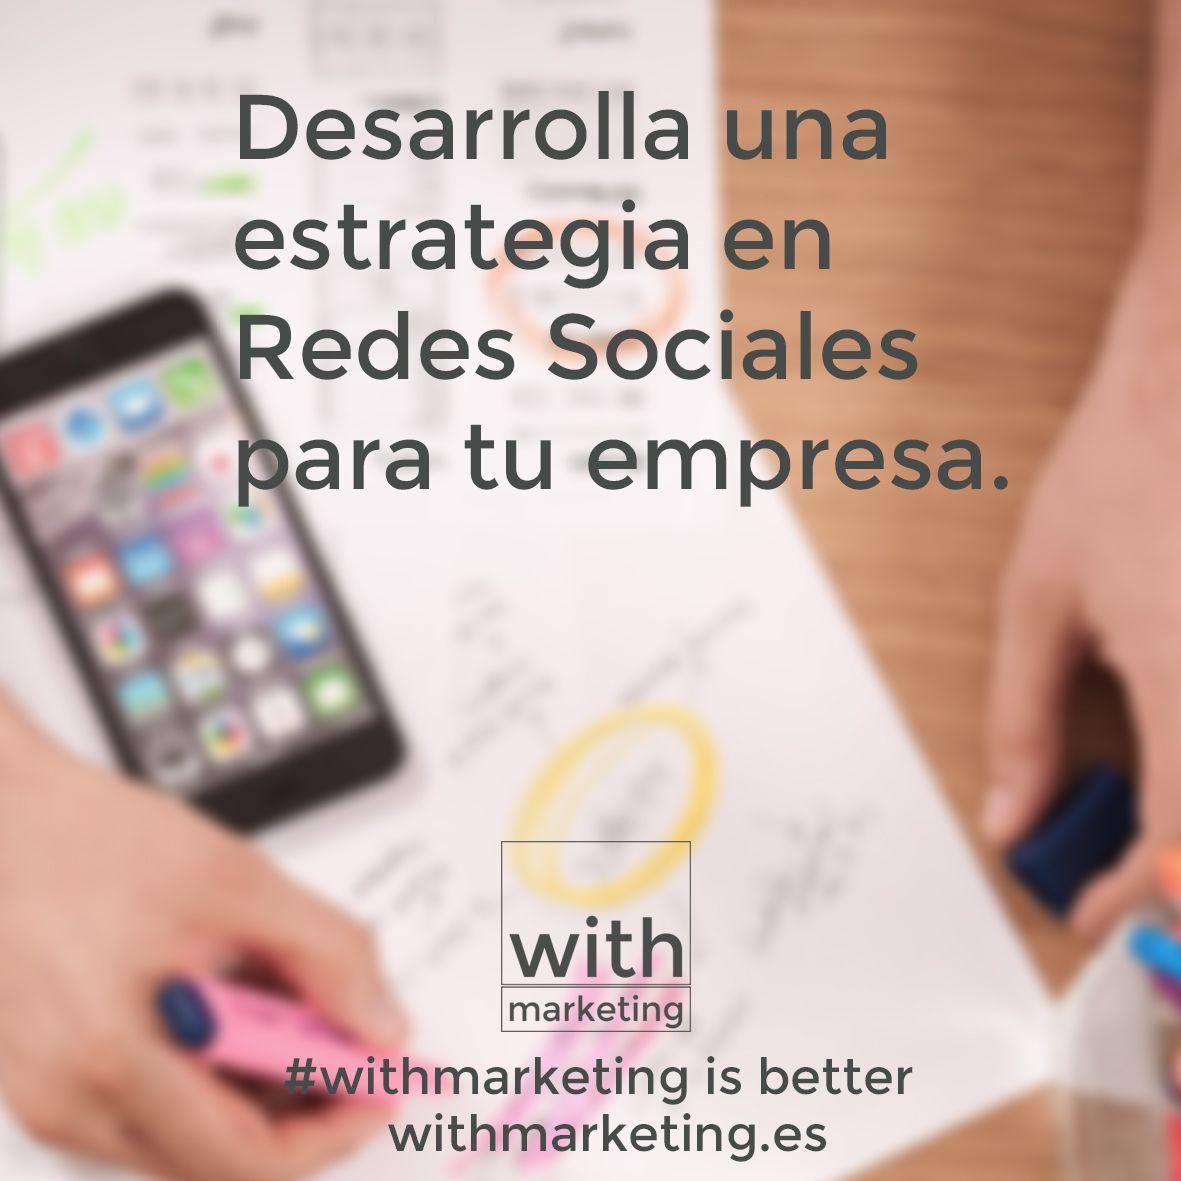 Redes Sociales para empresas #withmarketing #RedesSociales #SocialMedia #marketing #twitter #facebook #linkedin para #empresas